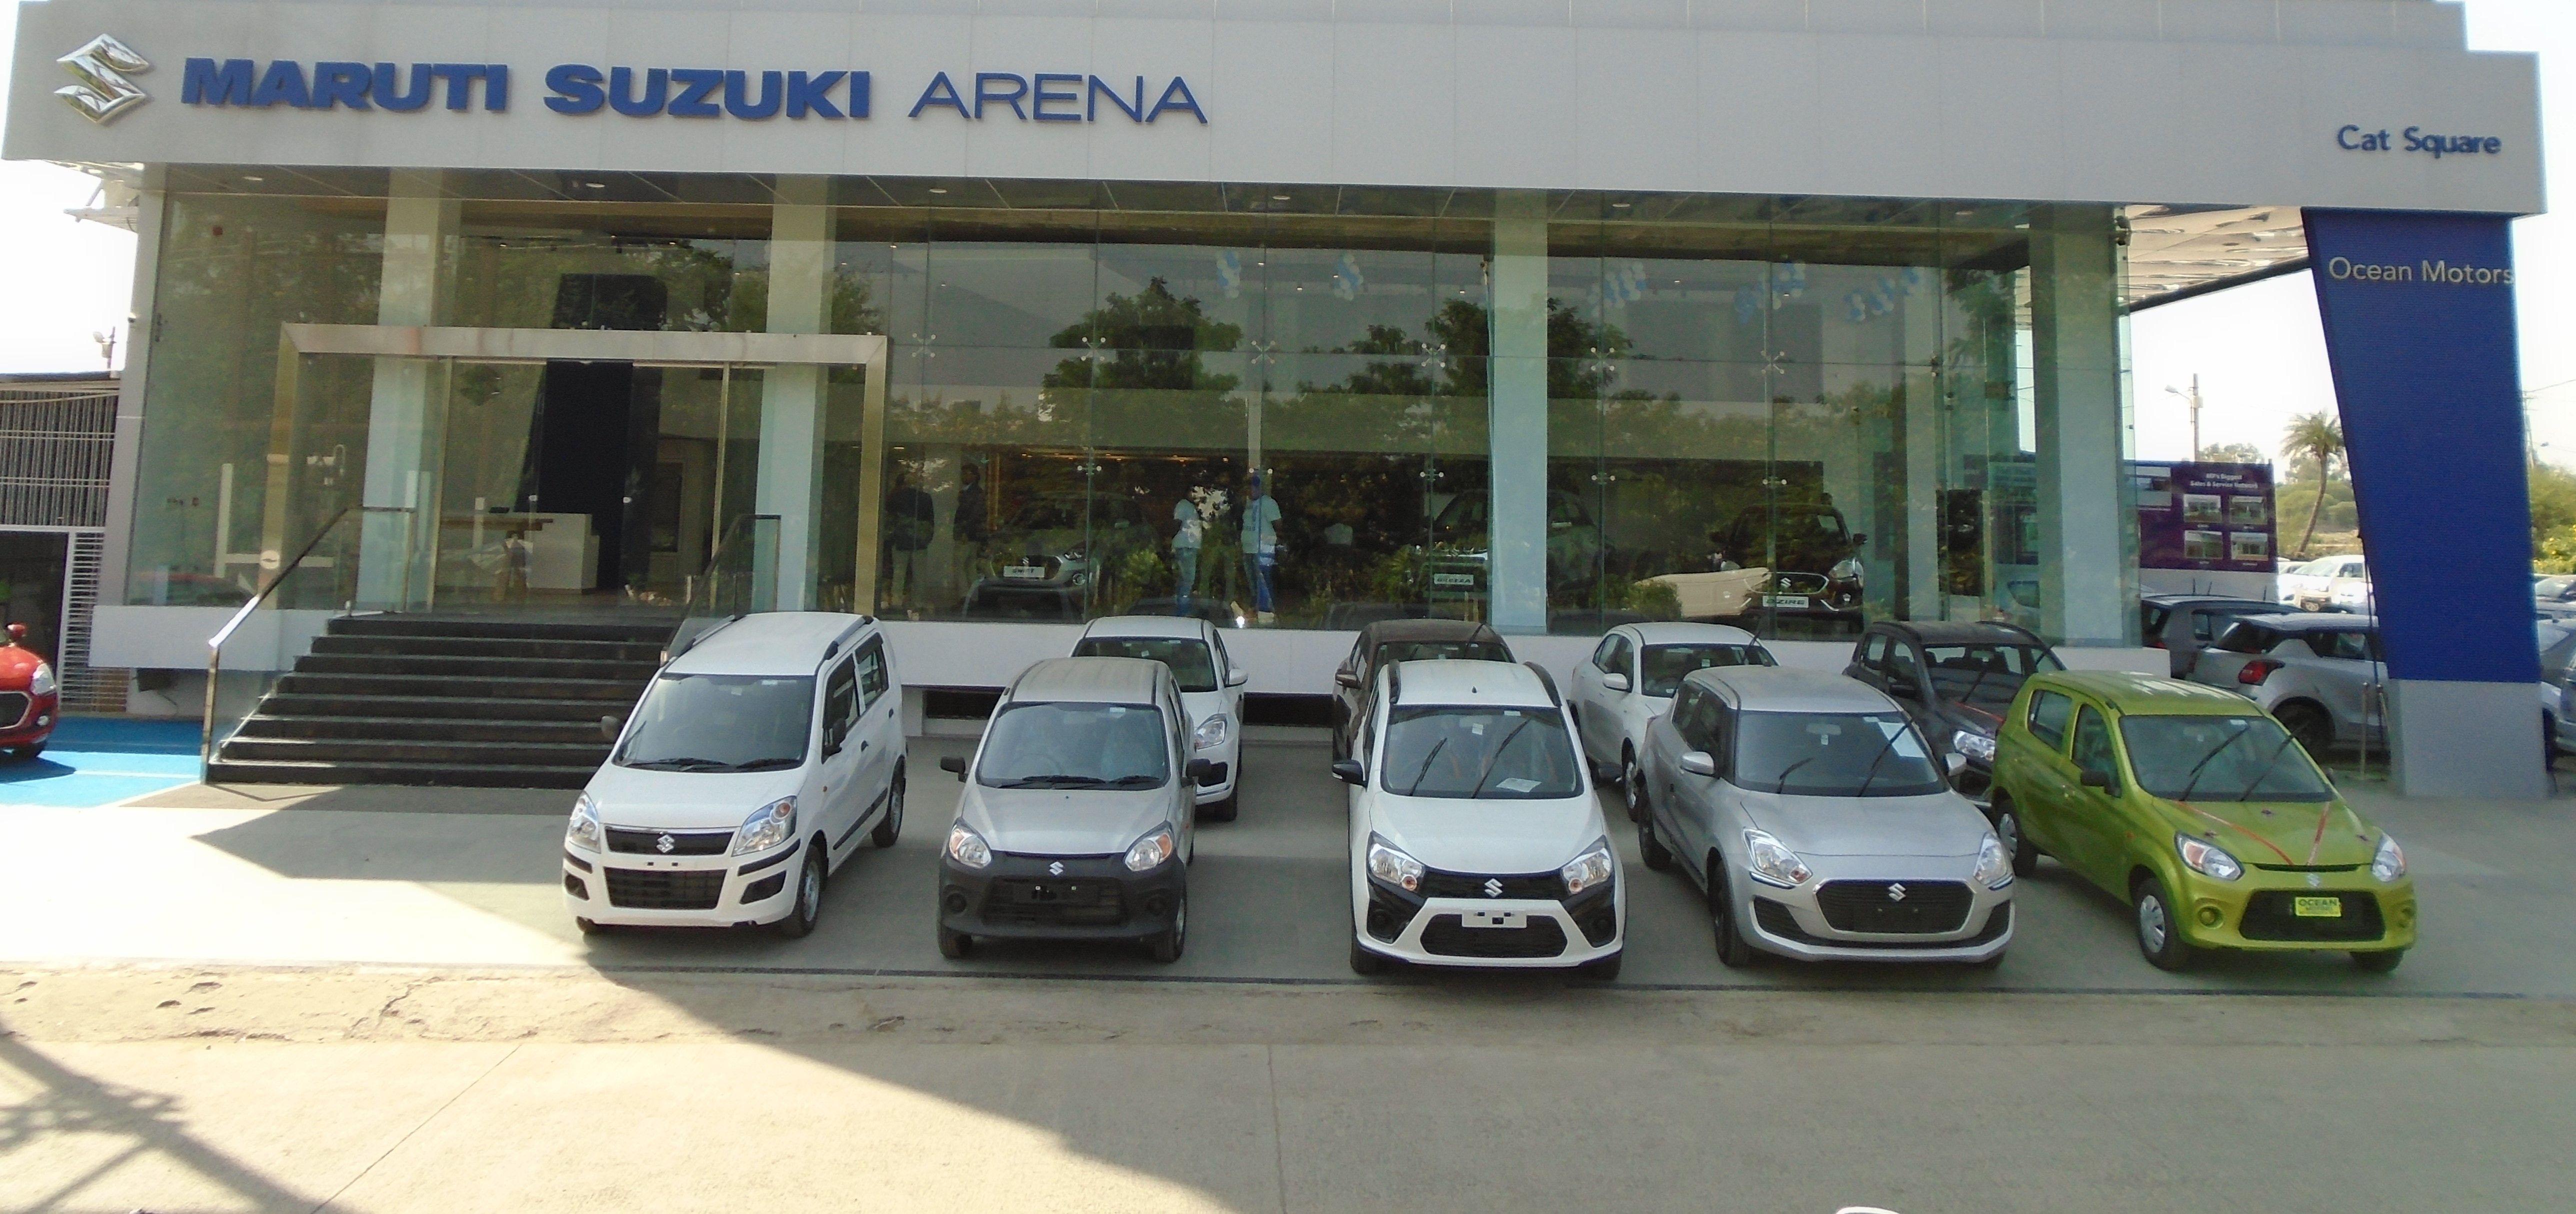 Suzuki Car Dealership >> Ocean Motors Is A Maruti Suzuki Arena Dealer In Cat Square